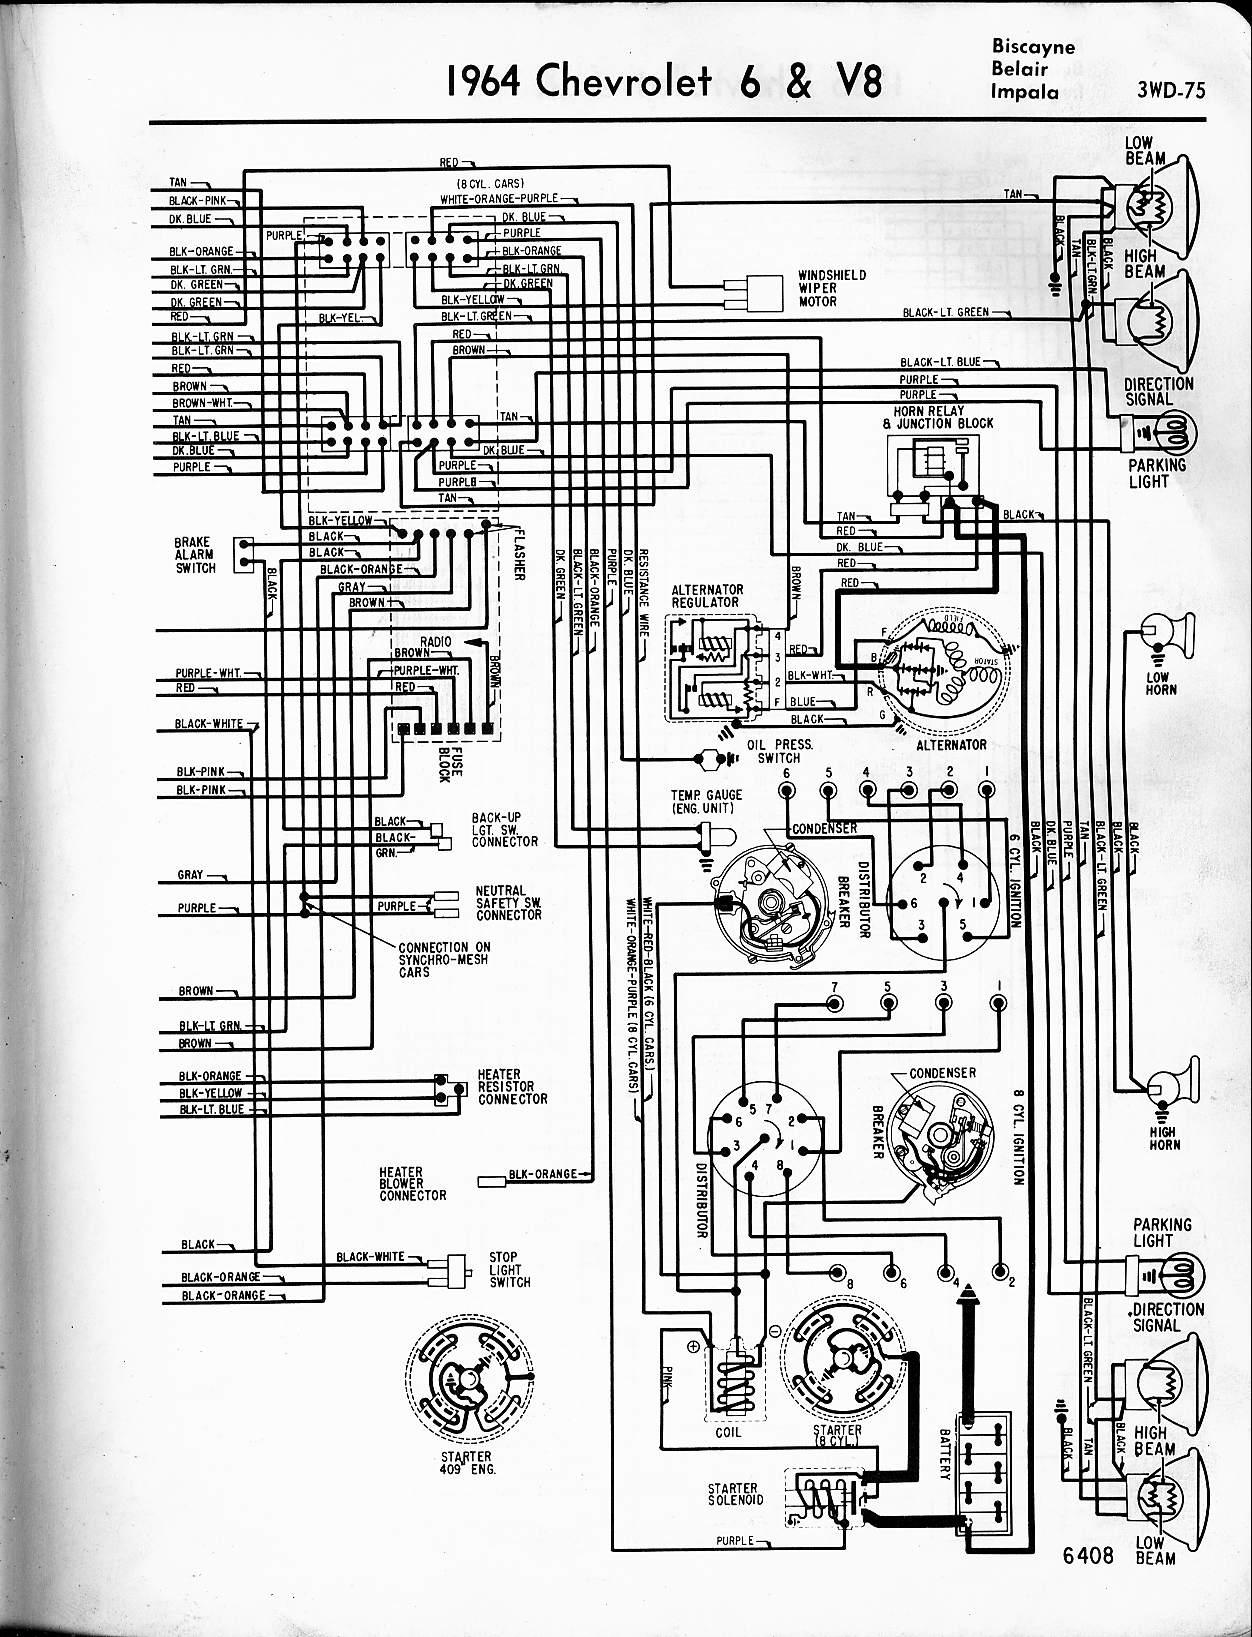 2003 impala starter wiring 2003 impala starter wiring googlea4